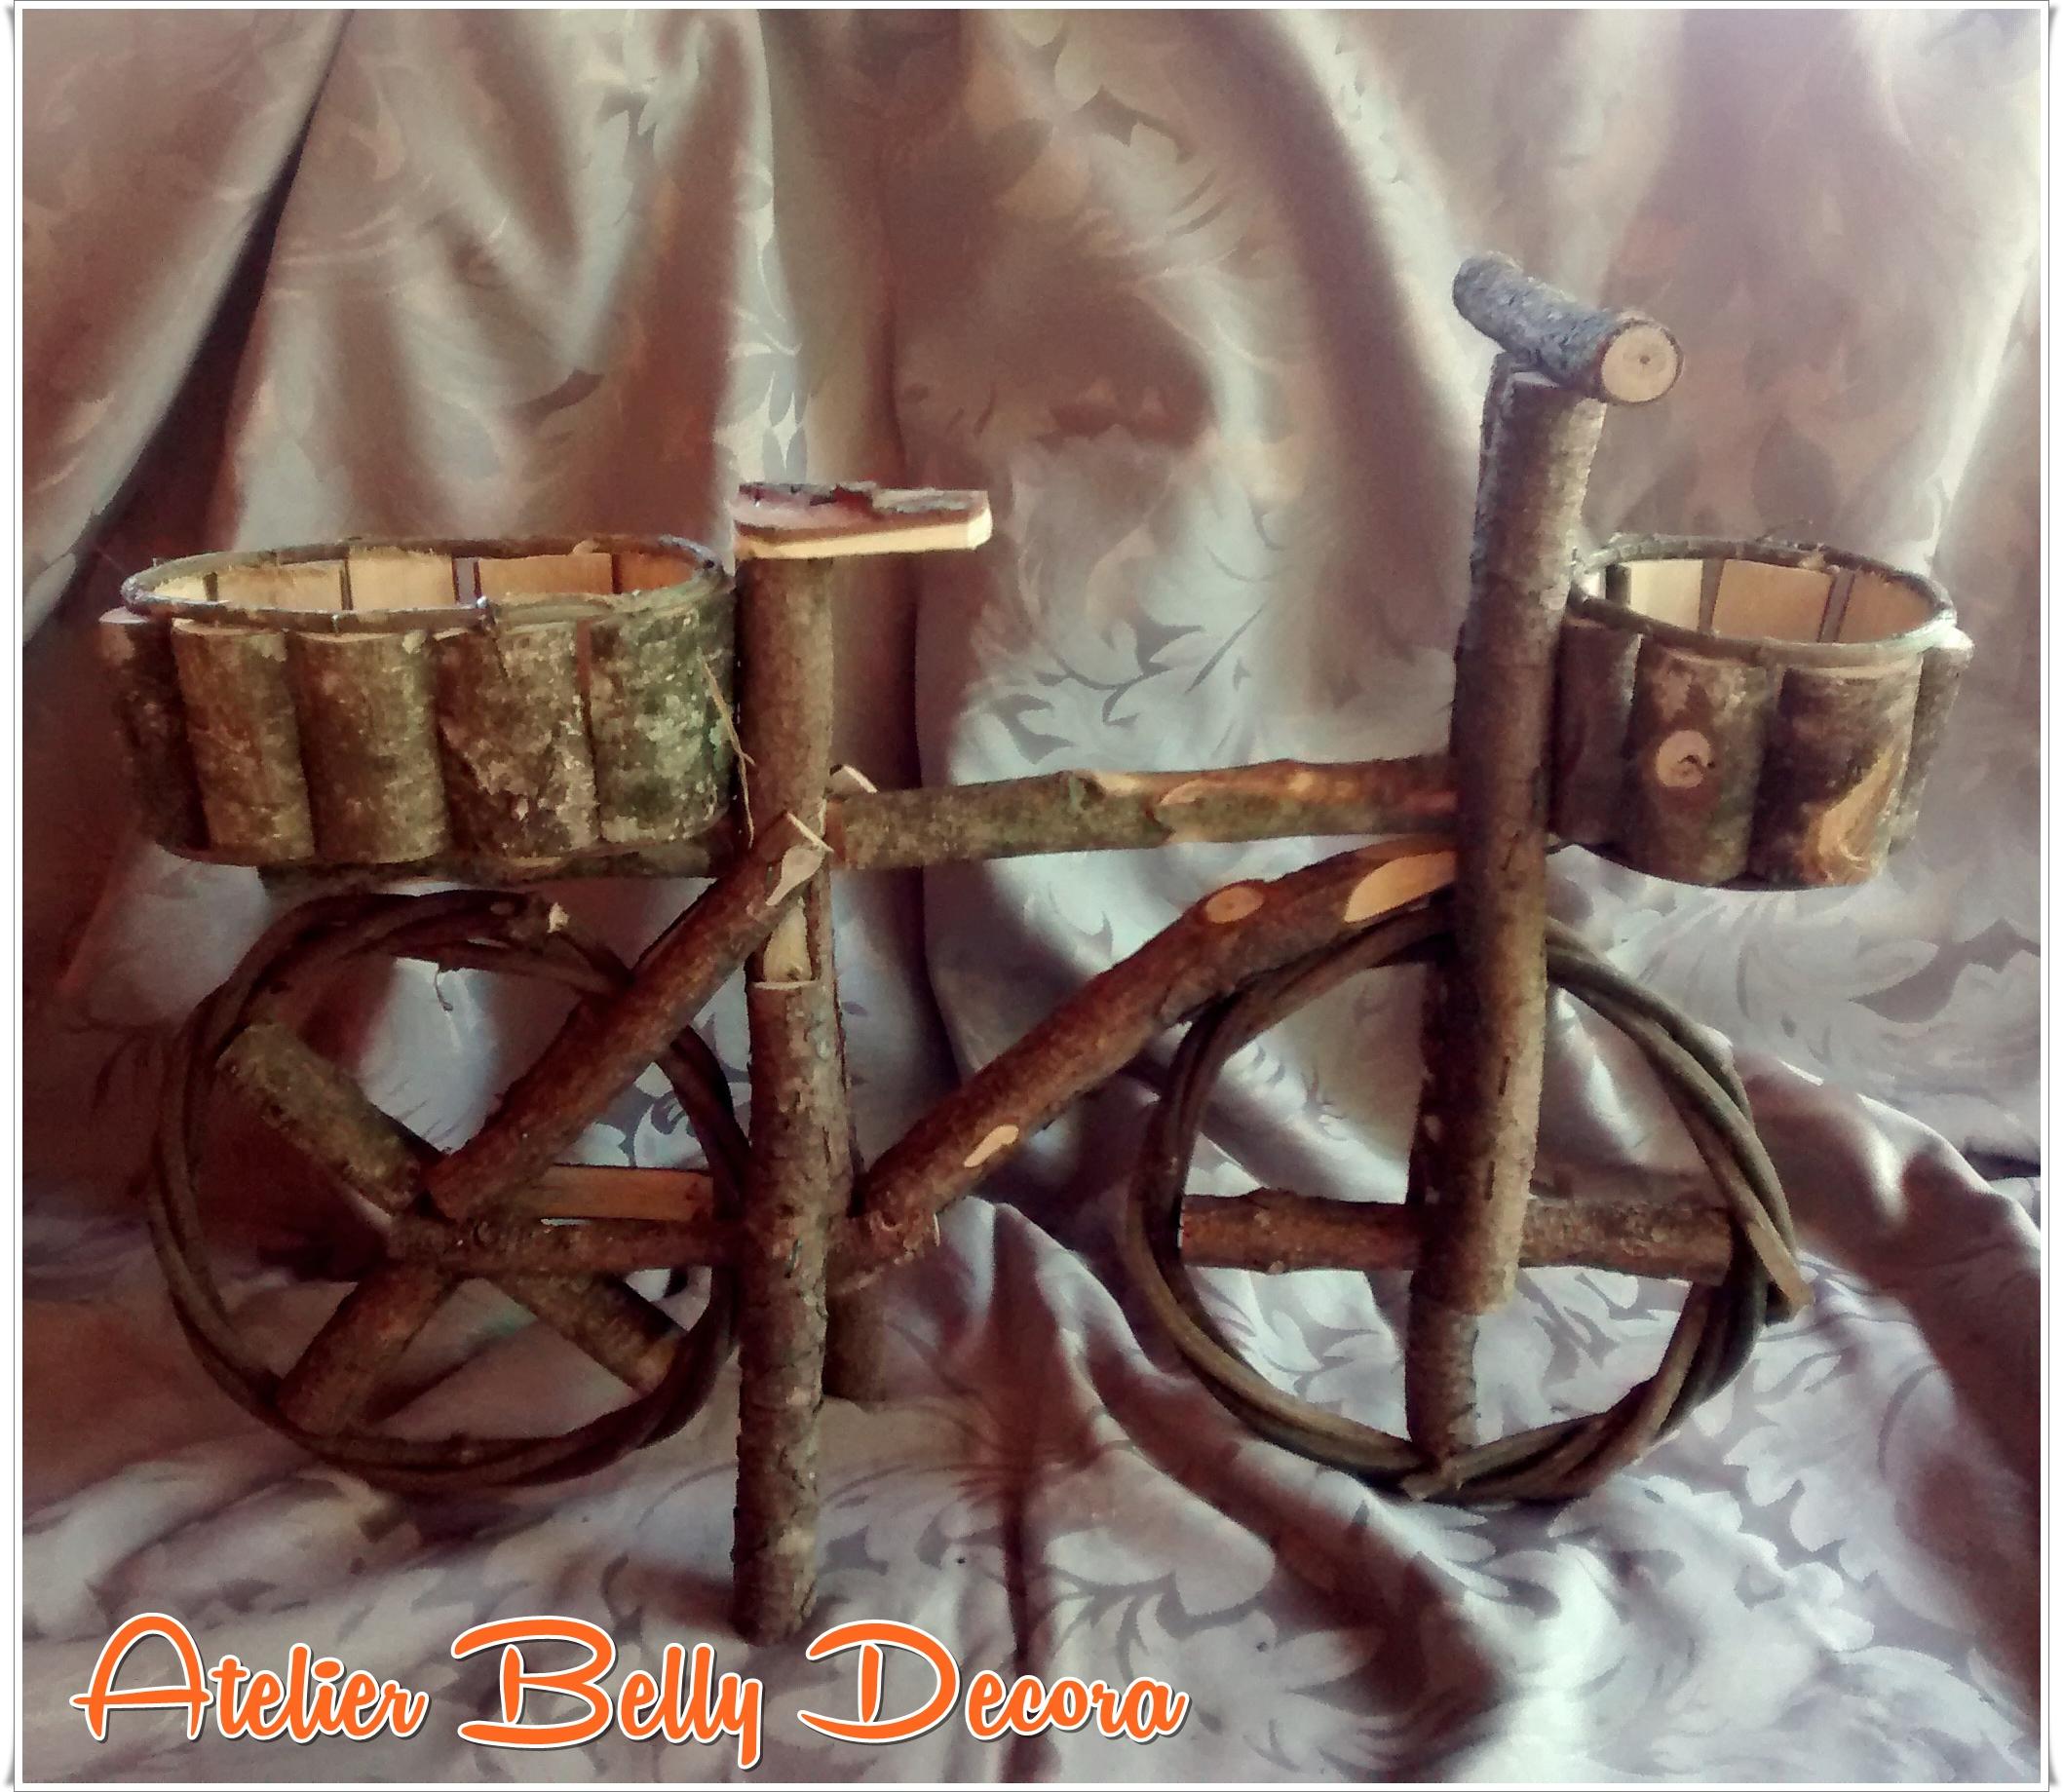 enfeite jardim bicicleta:bicicleta-c-cachepo-madeira-cipo-jardim-enfeite bicicleta-c-cachepo